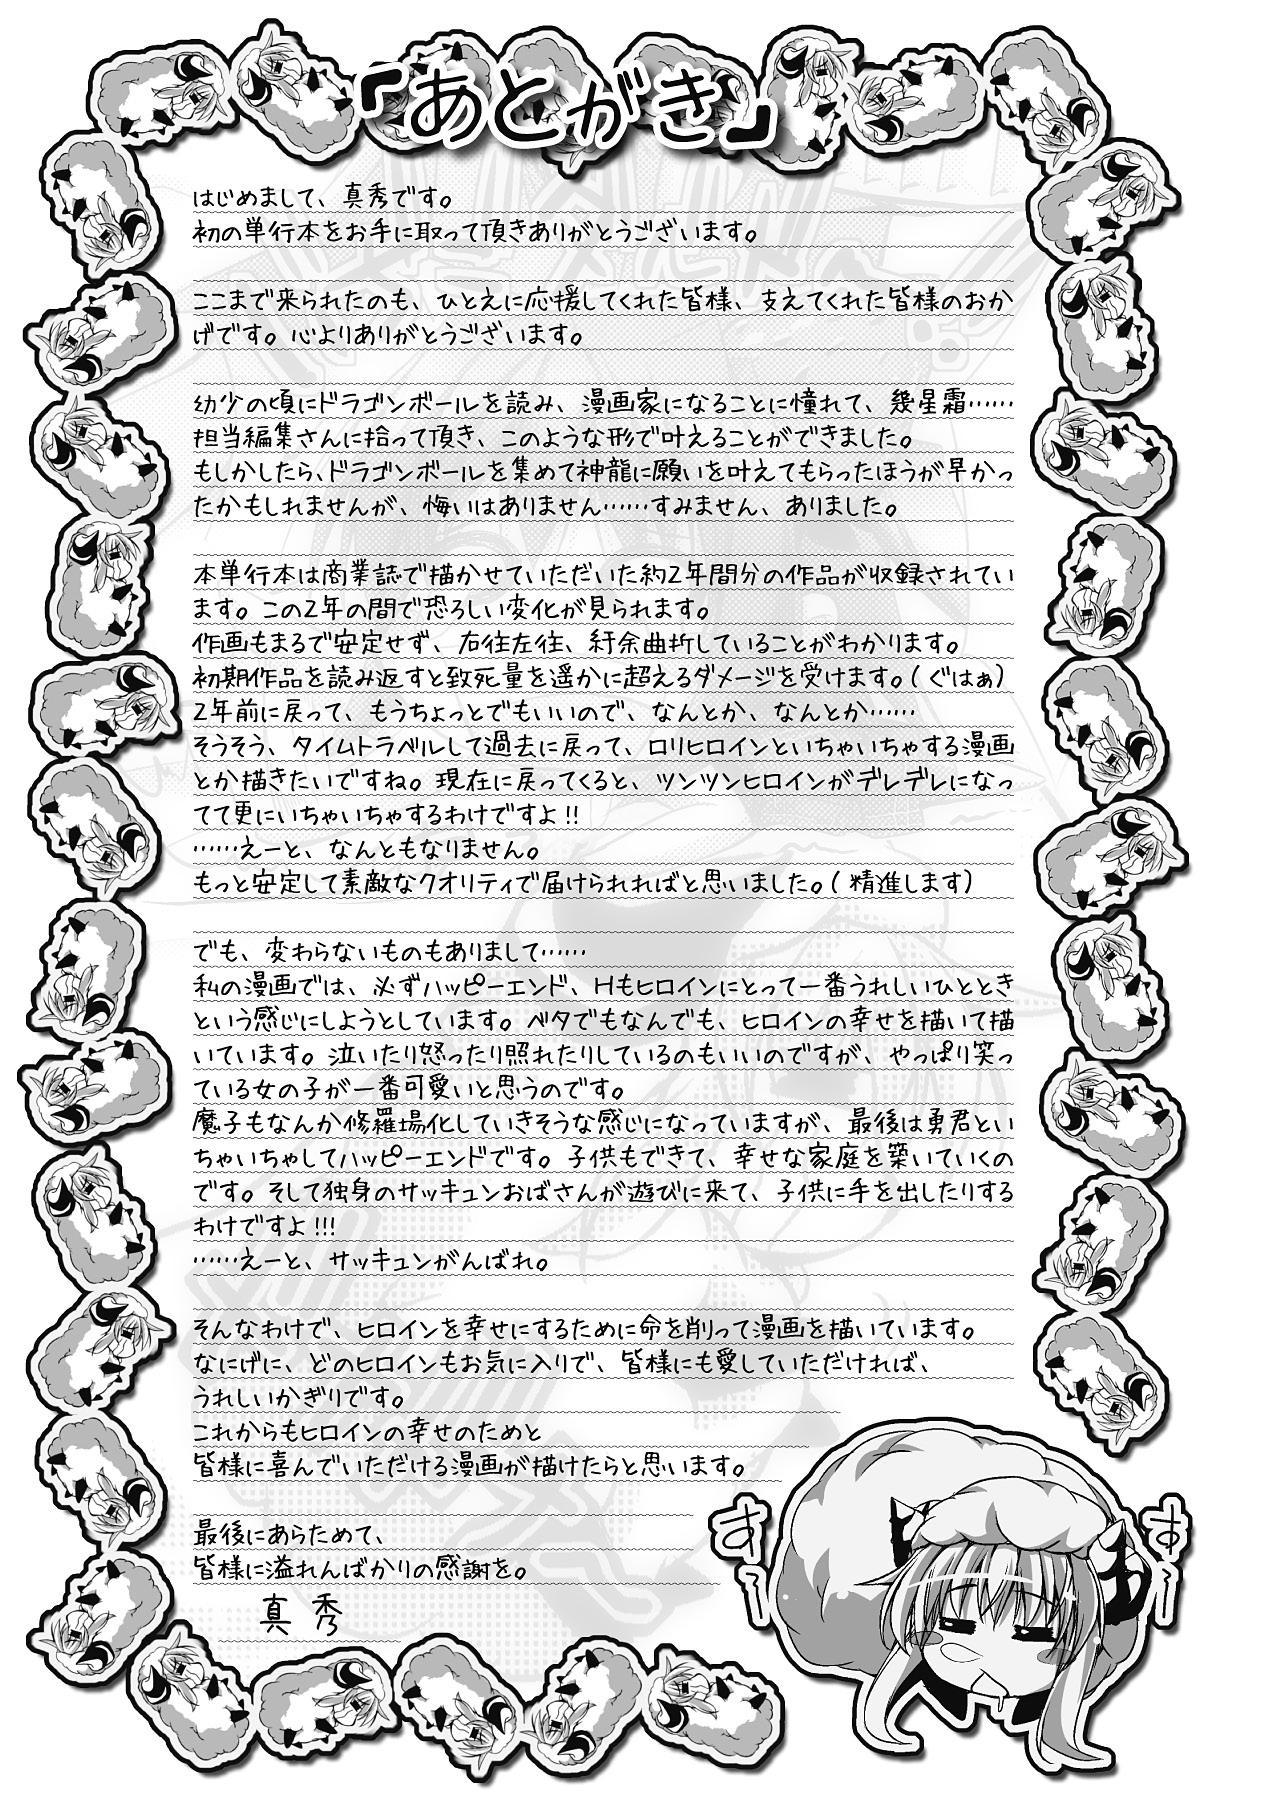 Amai Kuchibiru Torokeru Kuchibiru 168